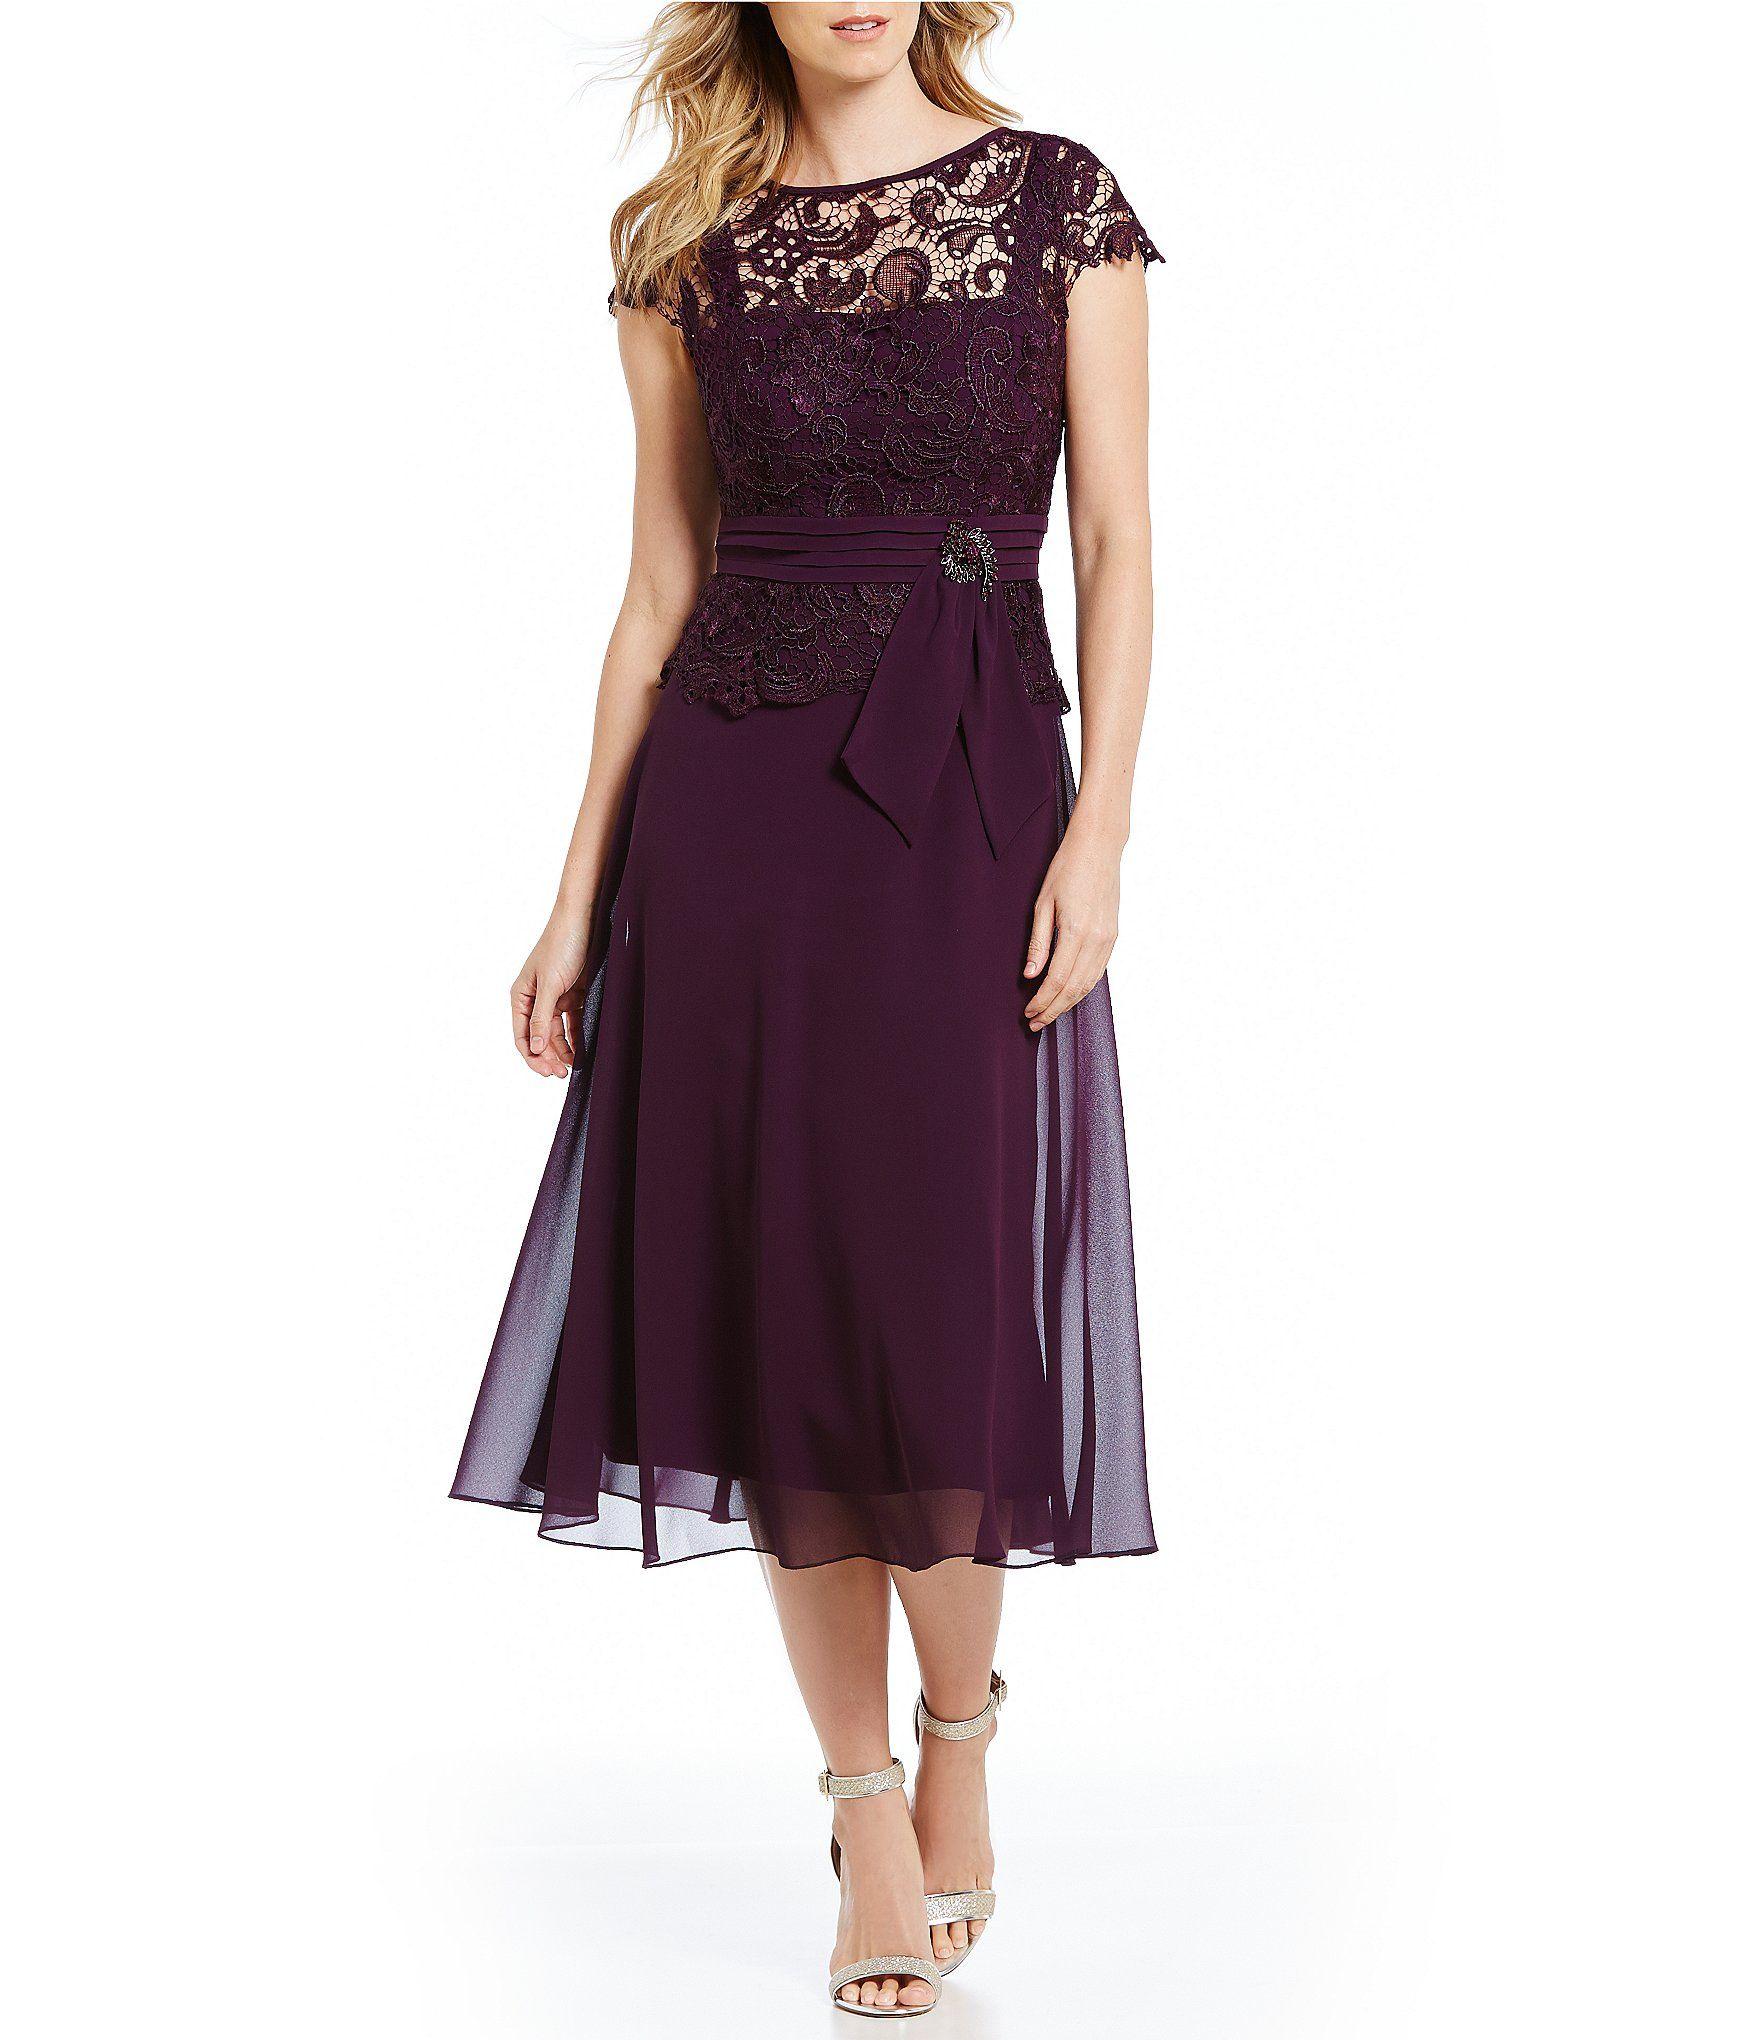 Dillards Bridal Party Dresses